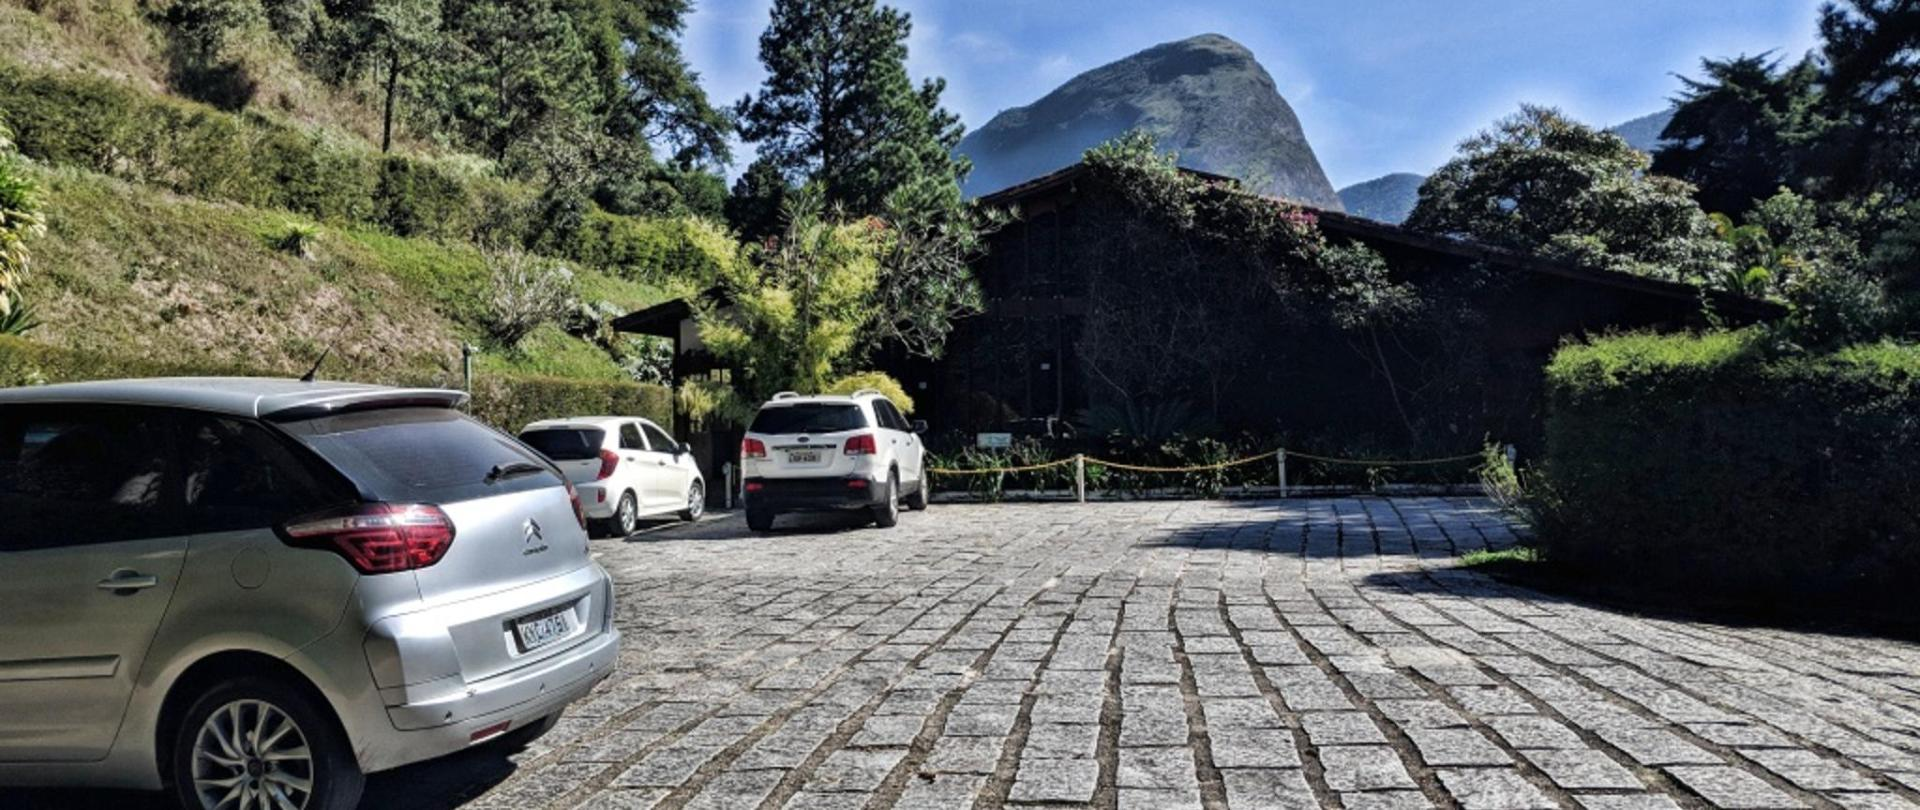 Estacionamento HDR.jpg